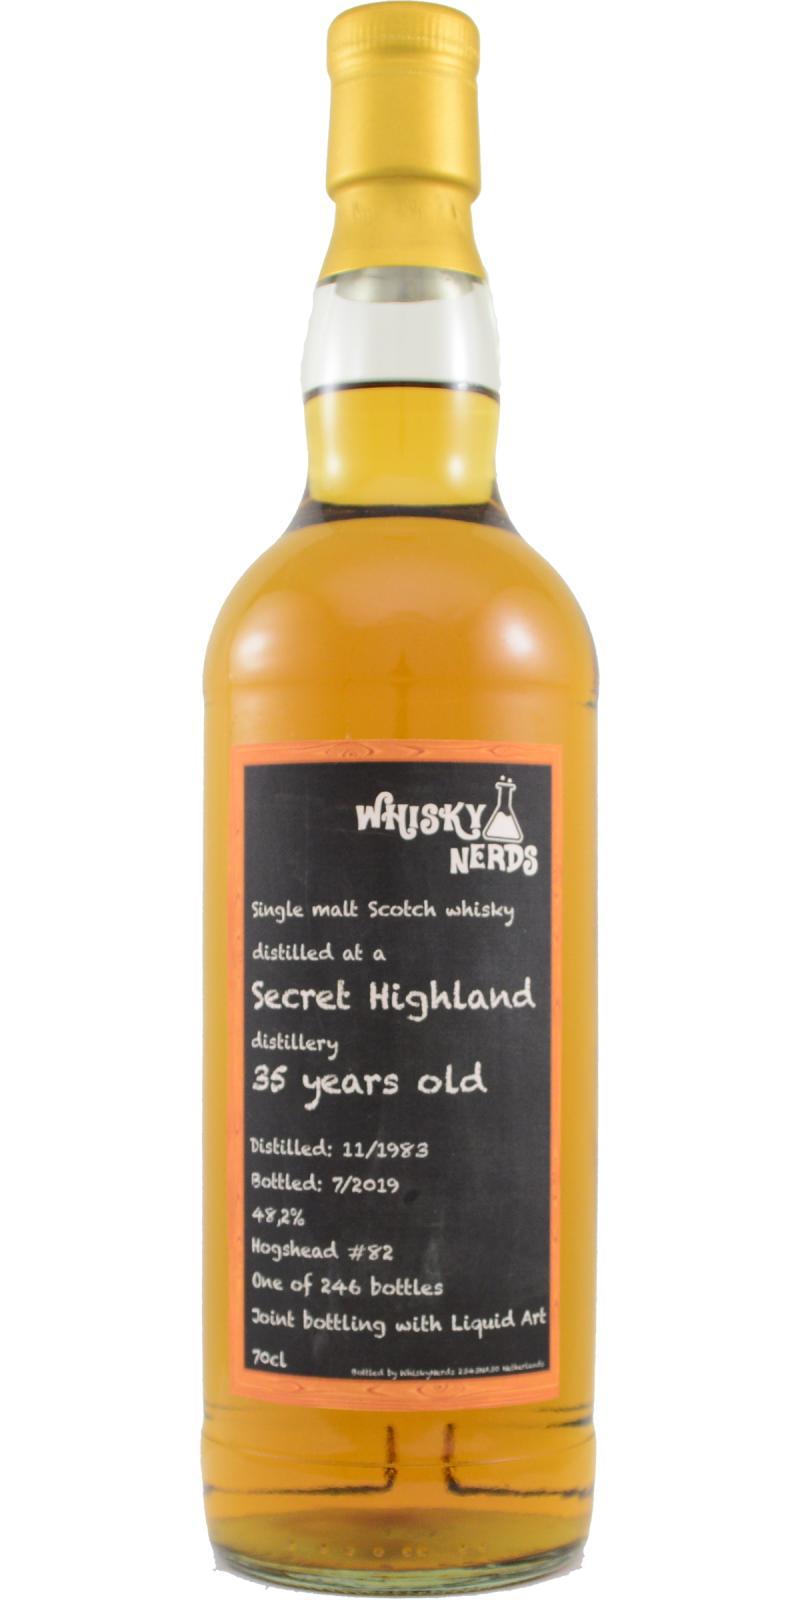 Secret Highland 1983 WN